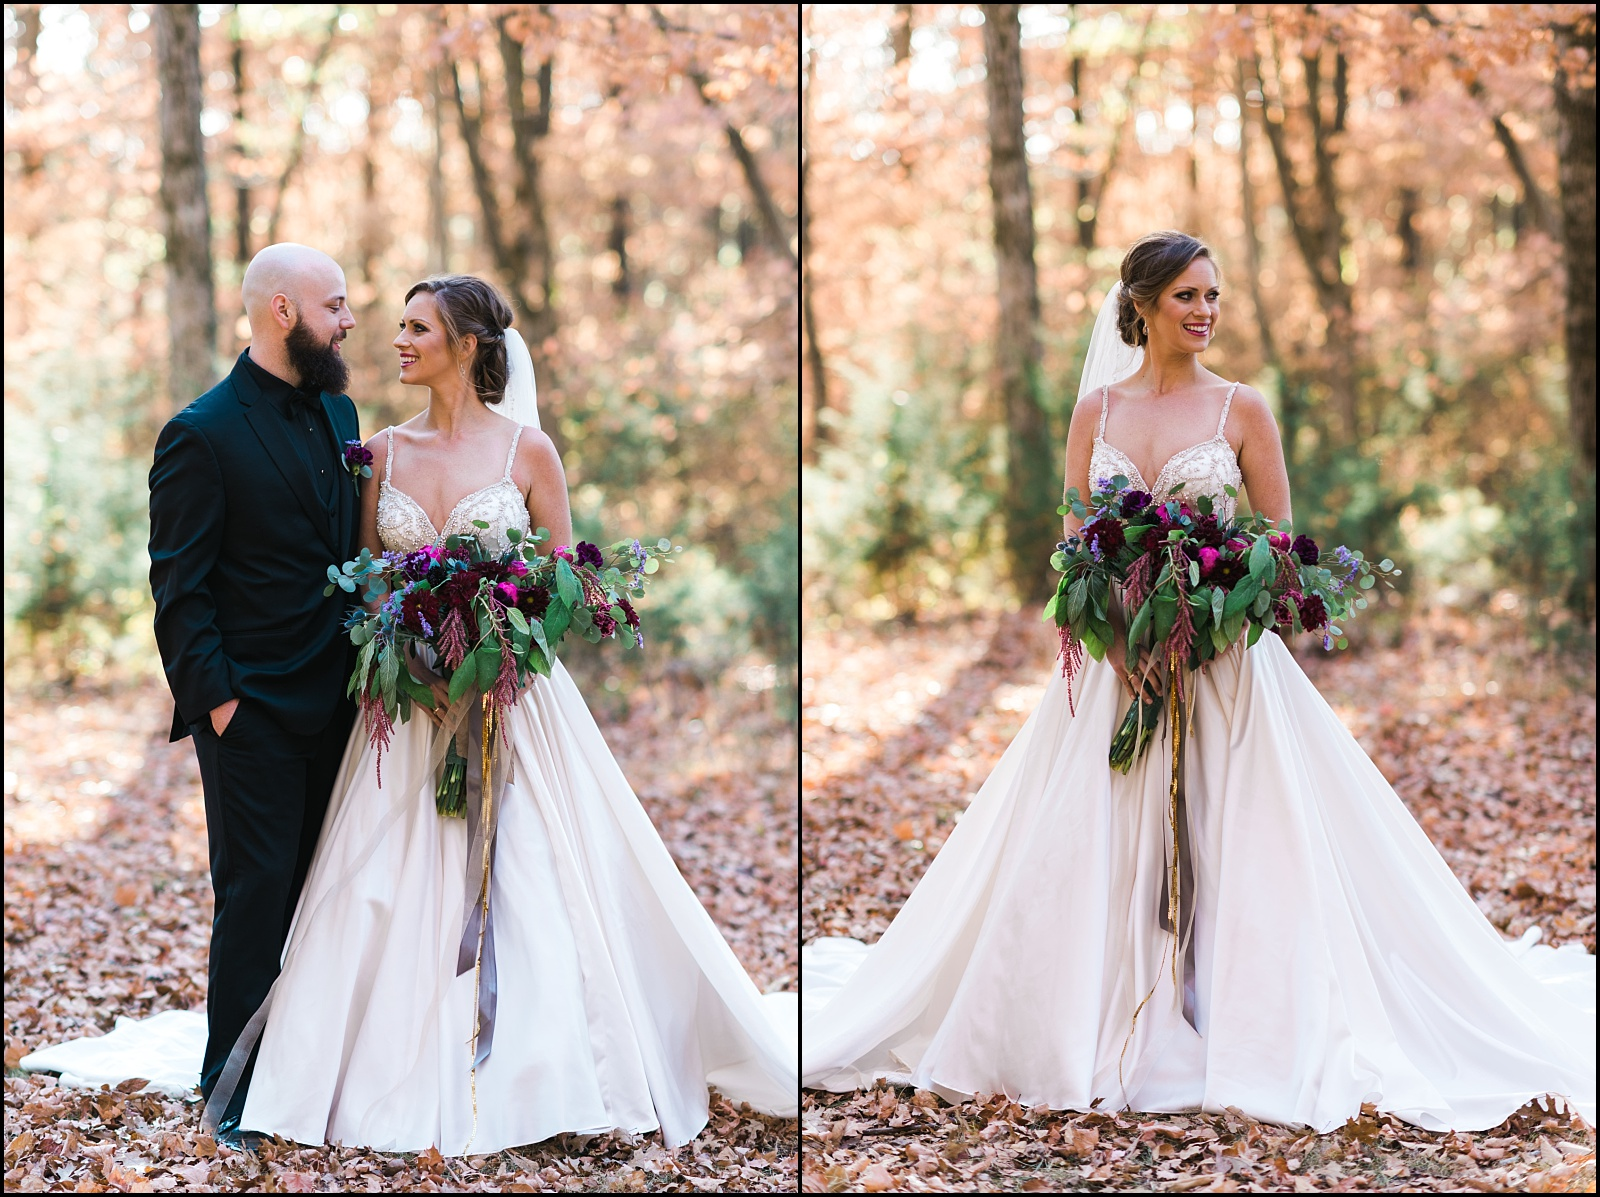 Wedding portraits at Cedars of Lebanon